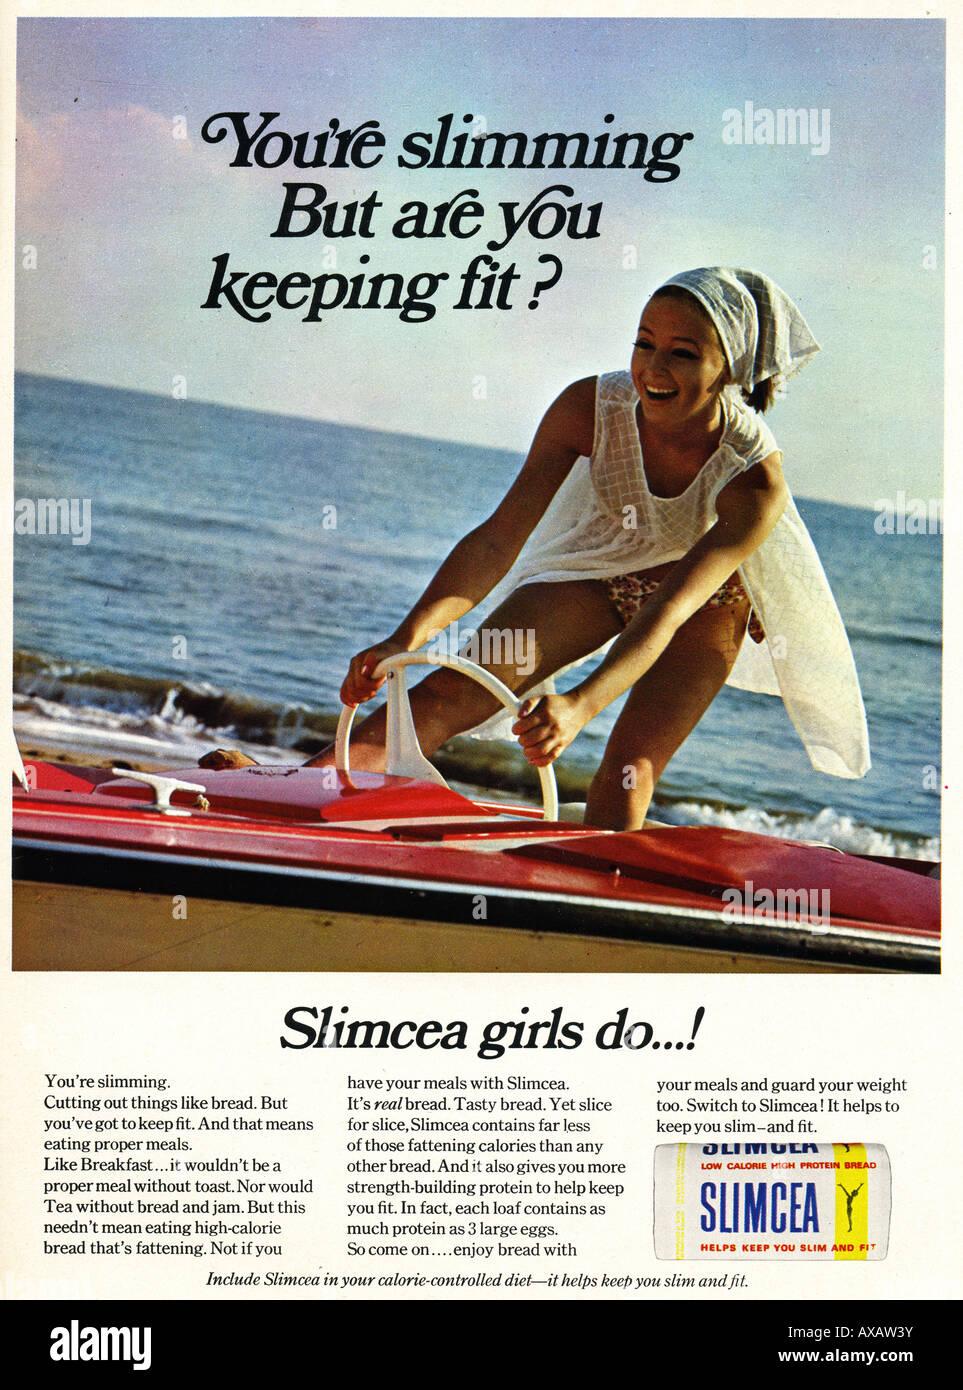 1960s April 1969 Magazine Advertisement For Alberto Vo5 Hairspray ...